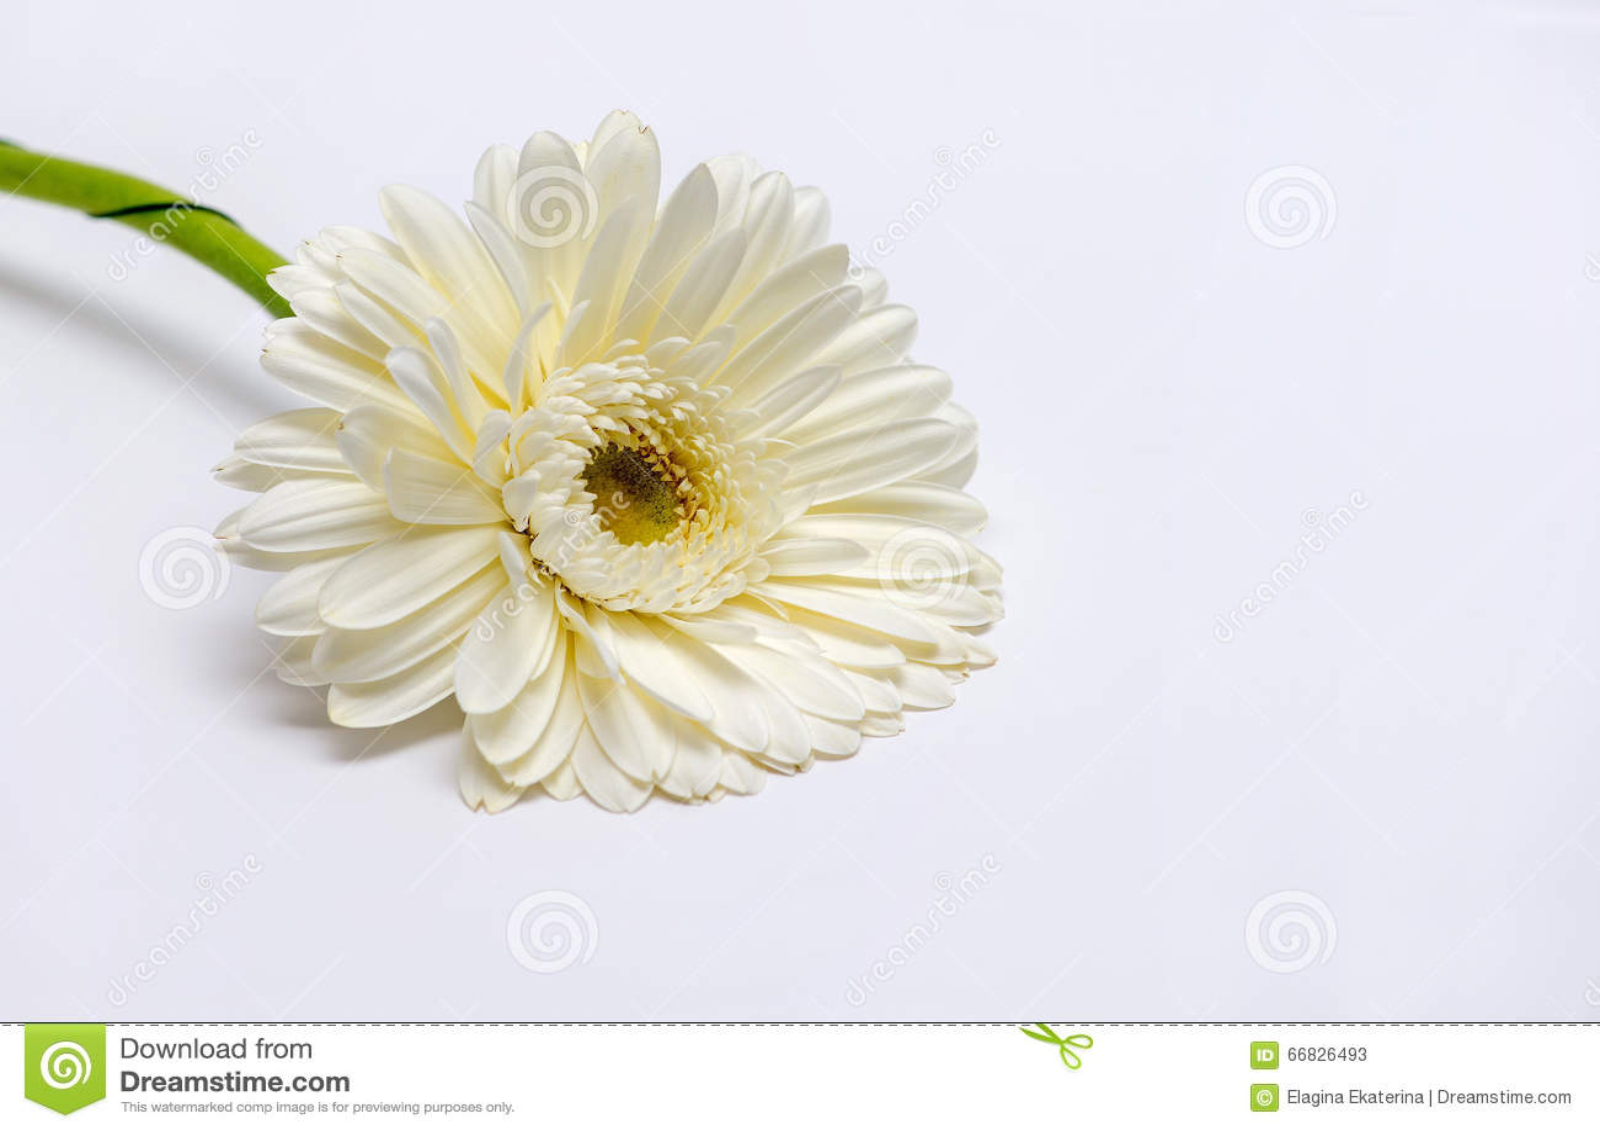 White Gerbera Flower Stock Image Image Of Petal Fresh 66826493